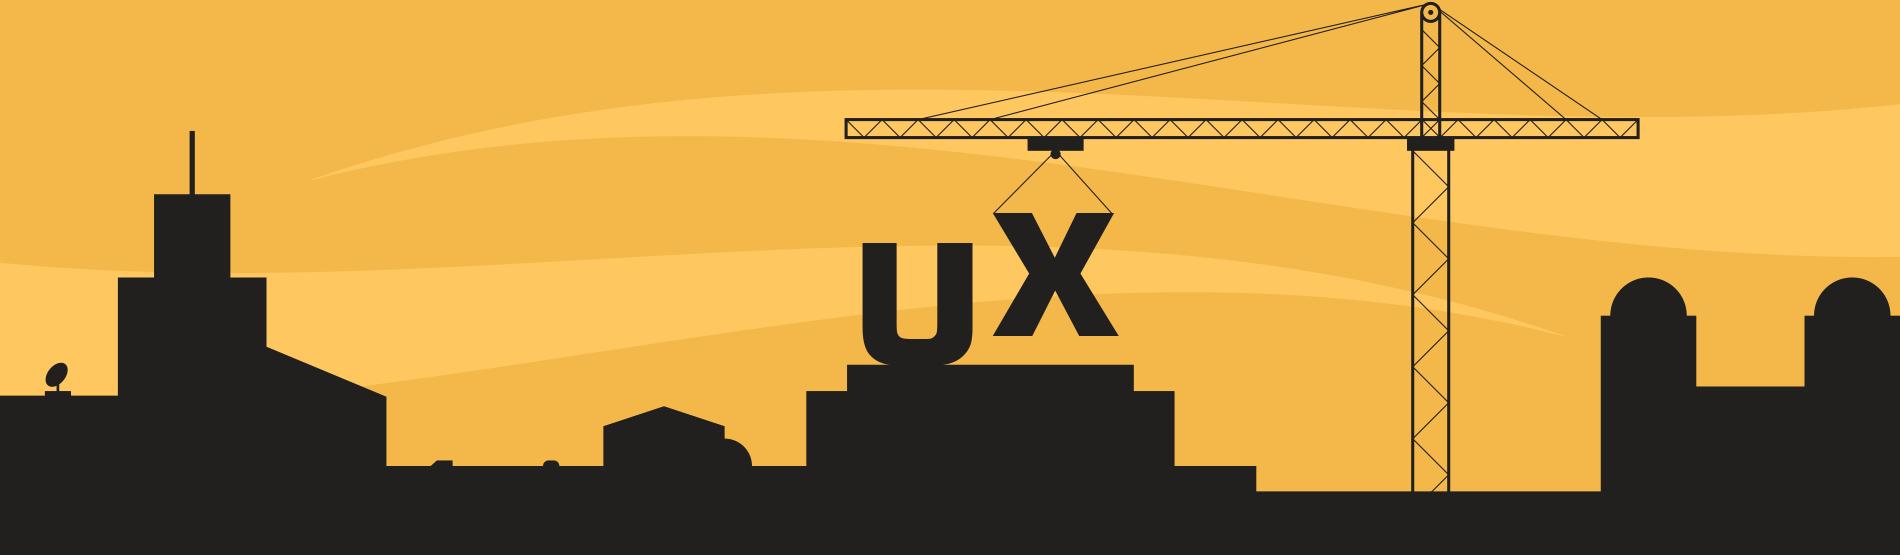 building-ux.png